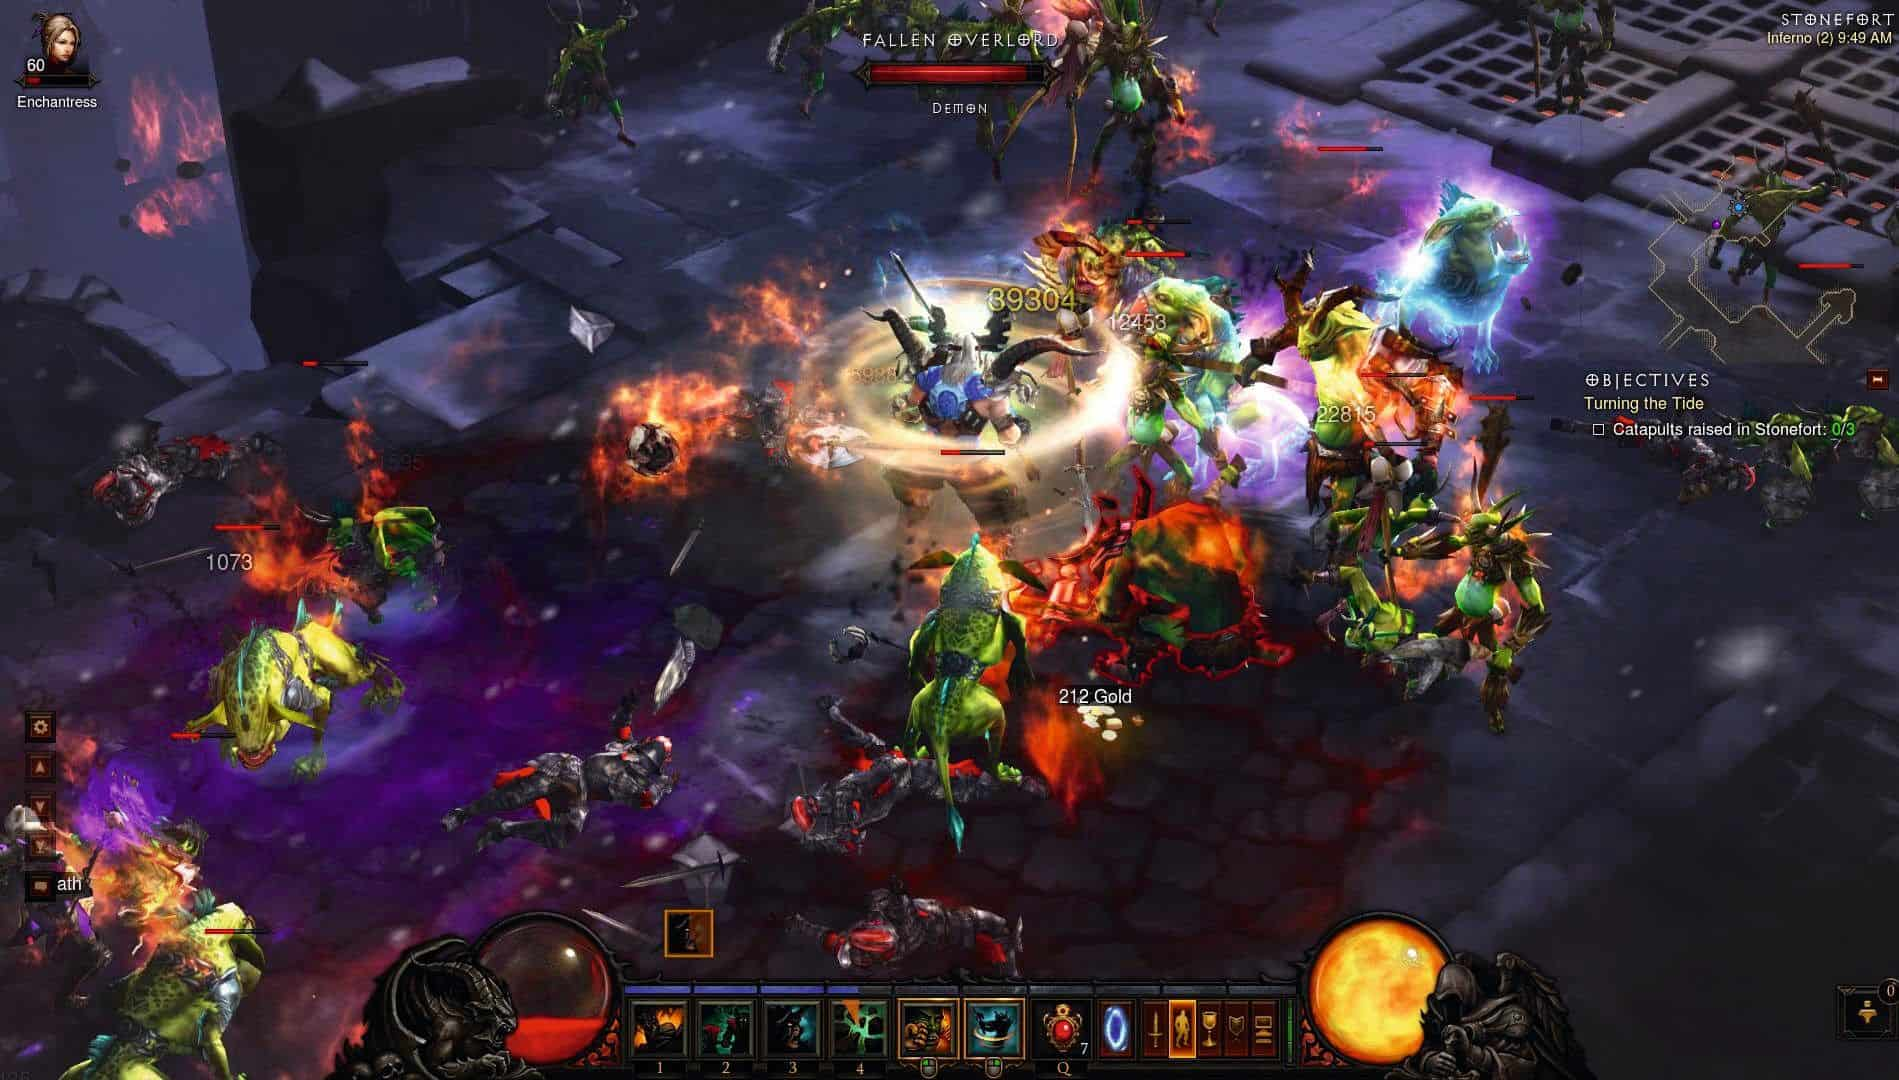 Diablo 3 ros matchmakingDejting Pearland TX